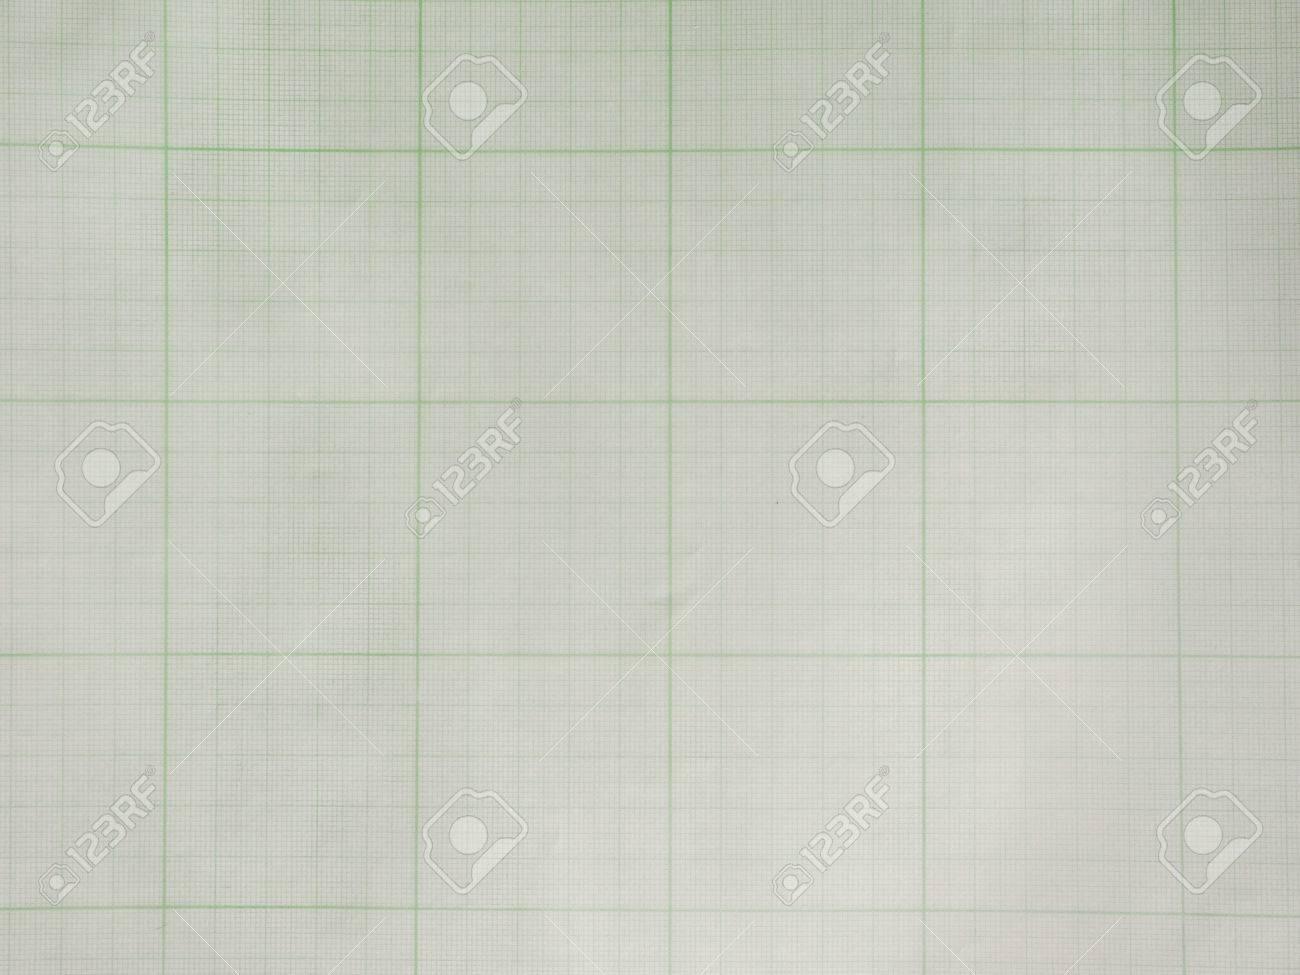 graph paper games - Tacu sotechco co